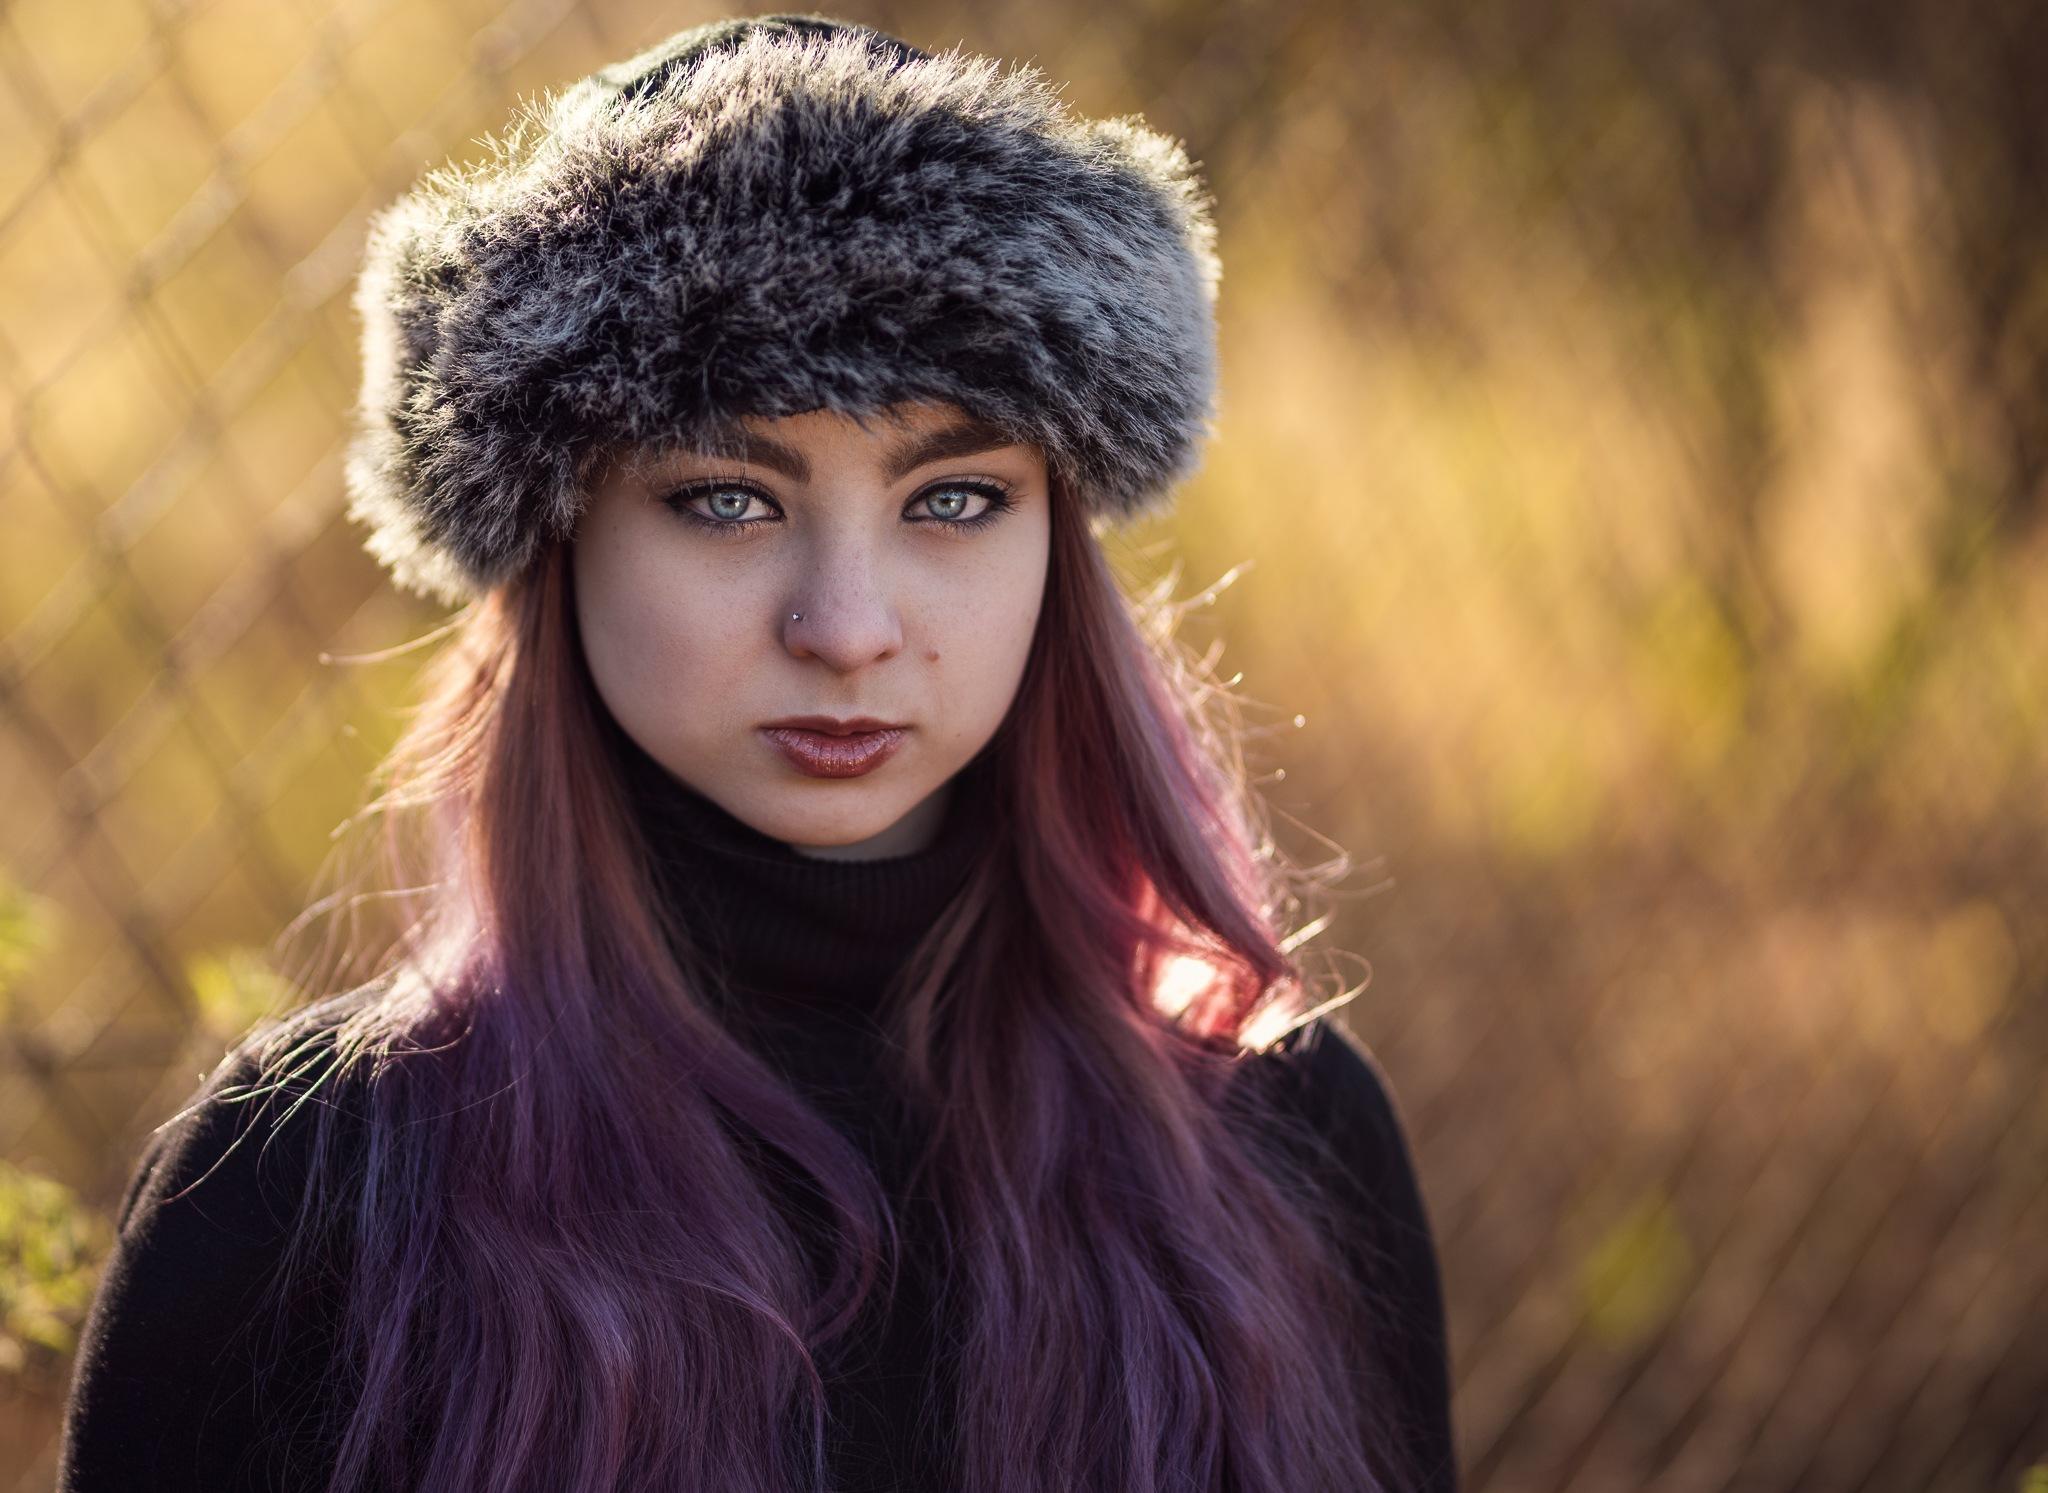 Paige by Jan Swanepoel